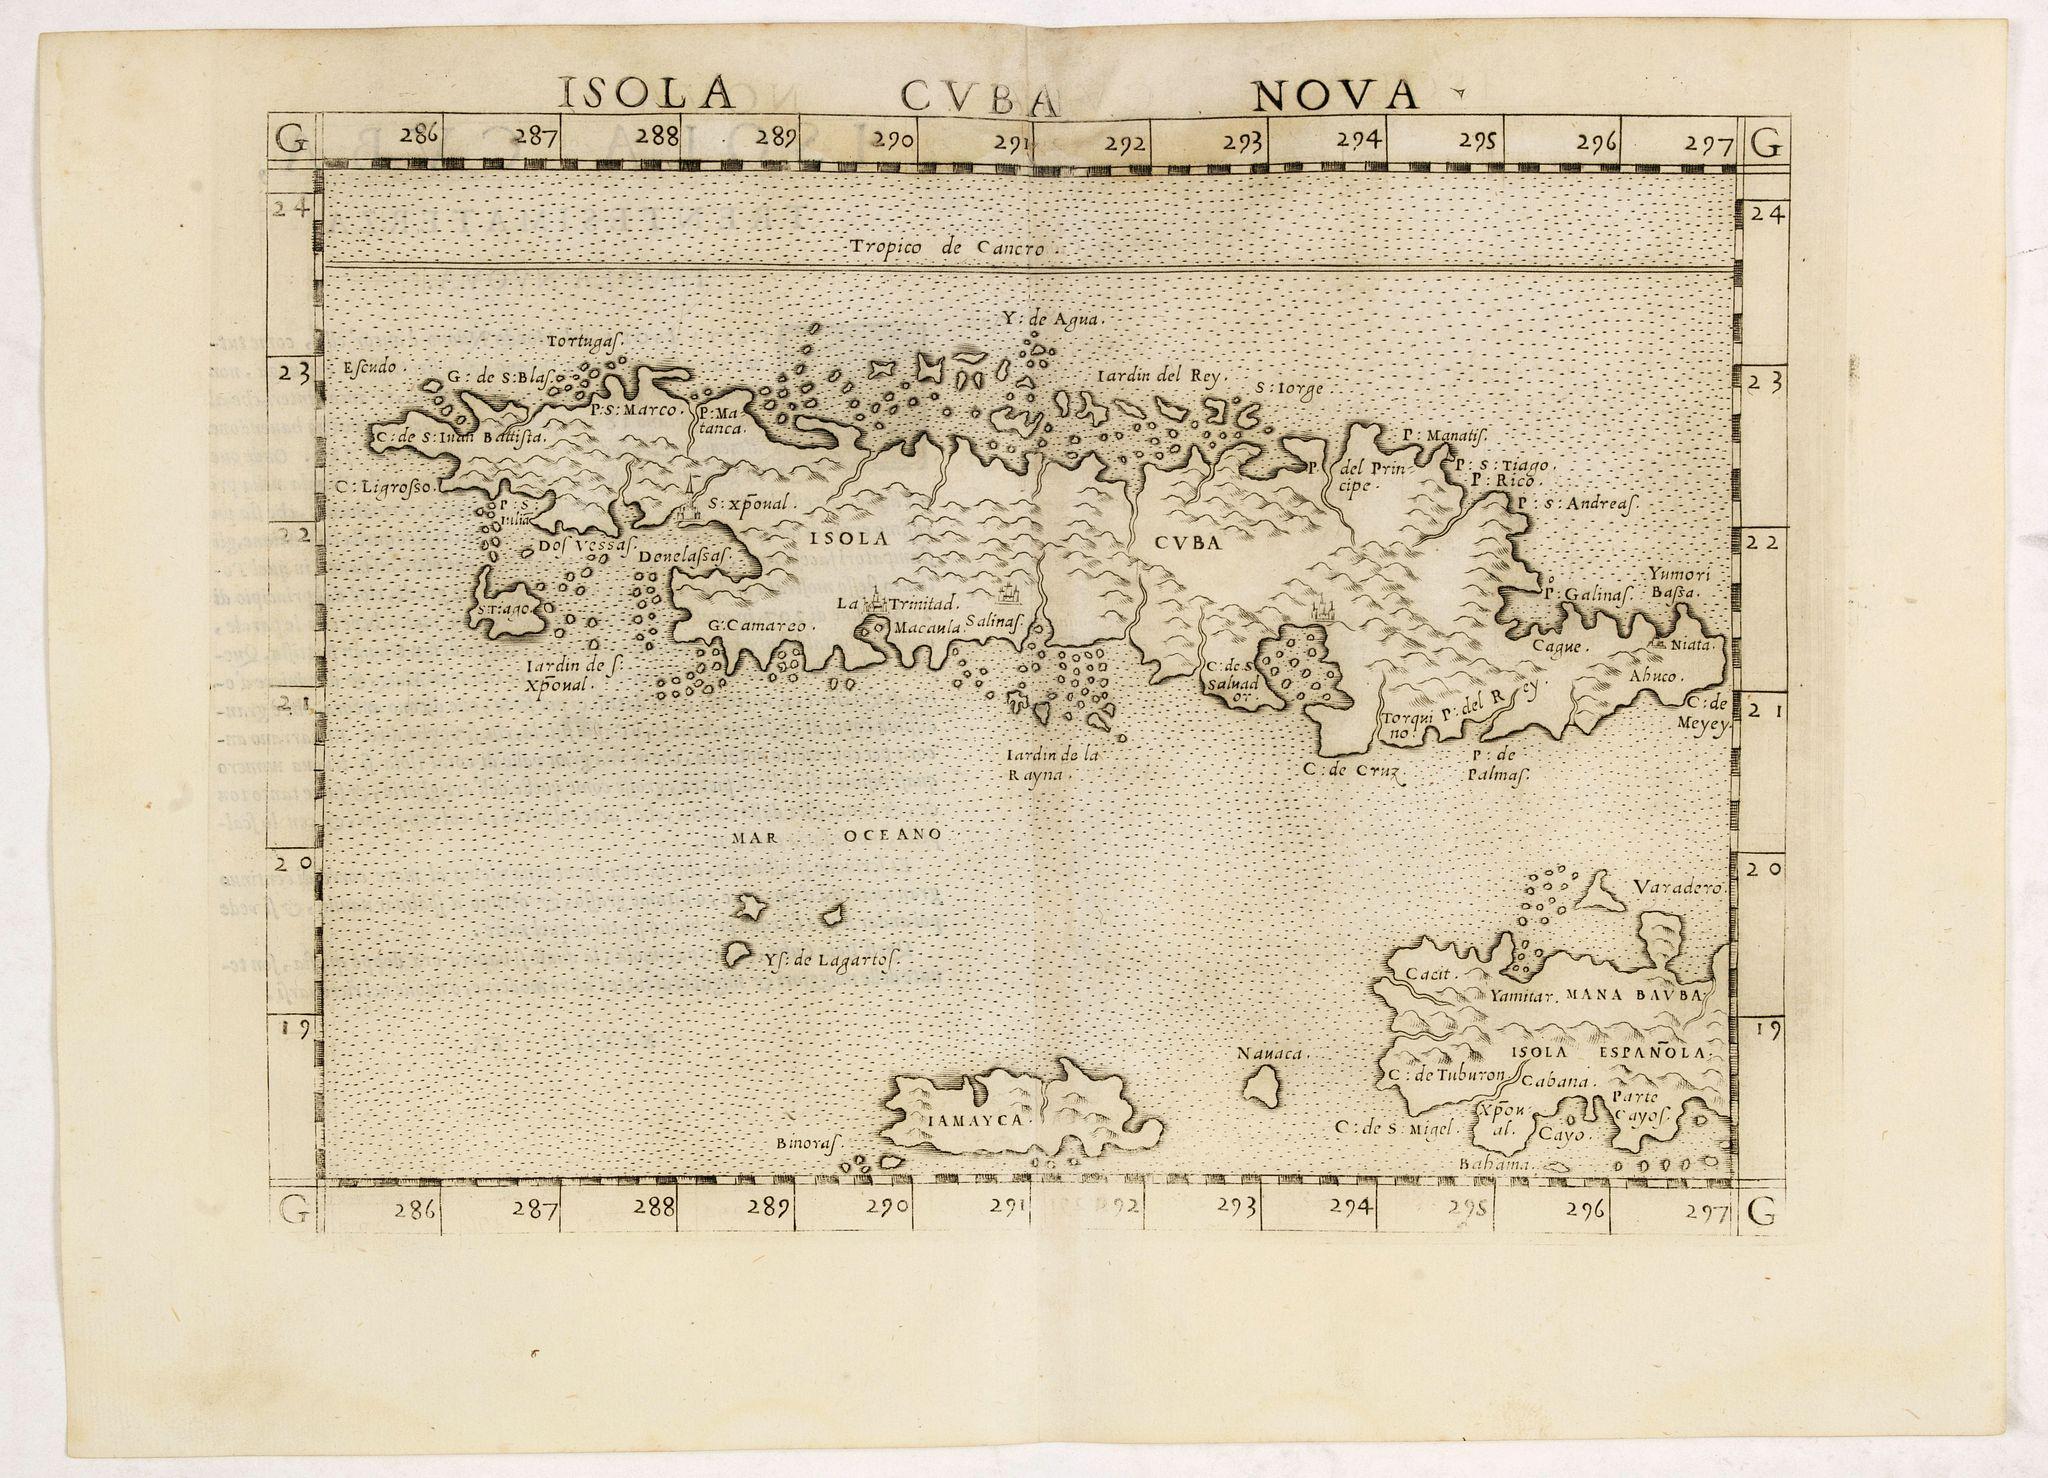 RUSCELLI, G. -  Isola Cuba Nova.